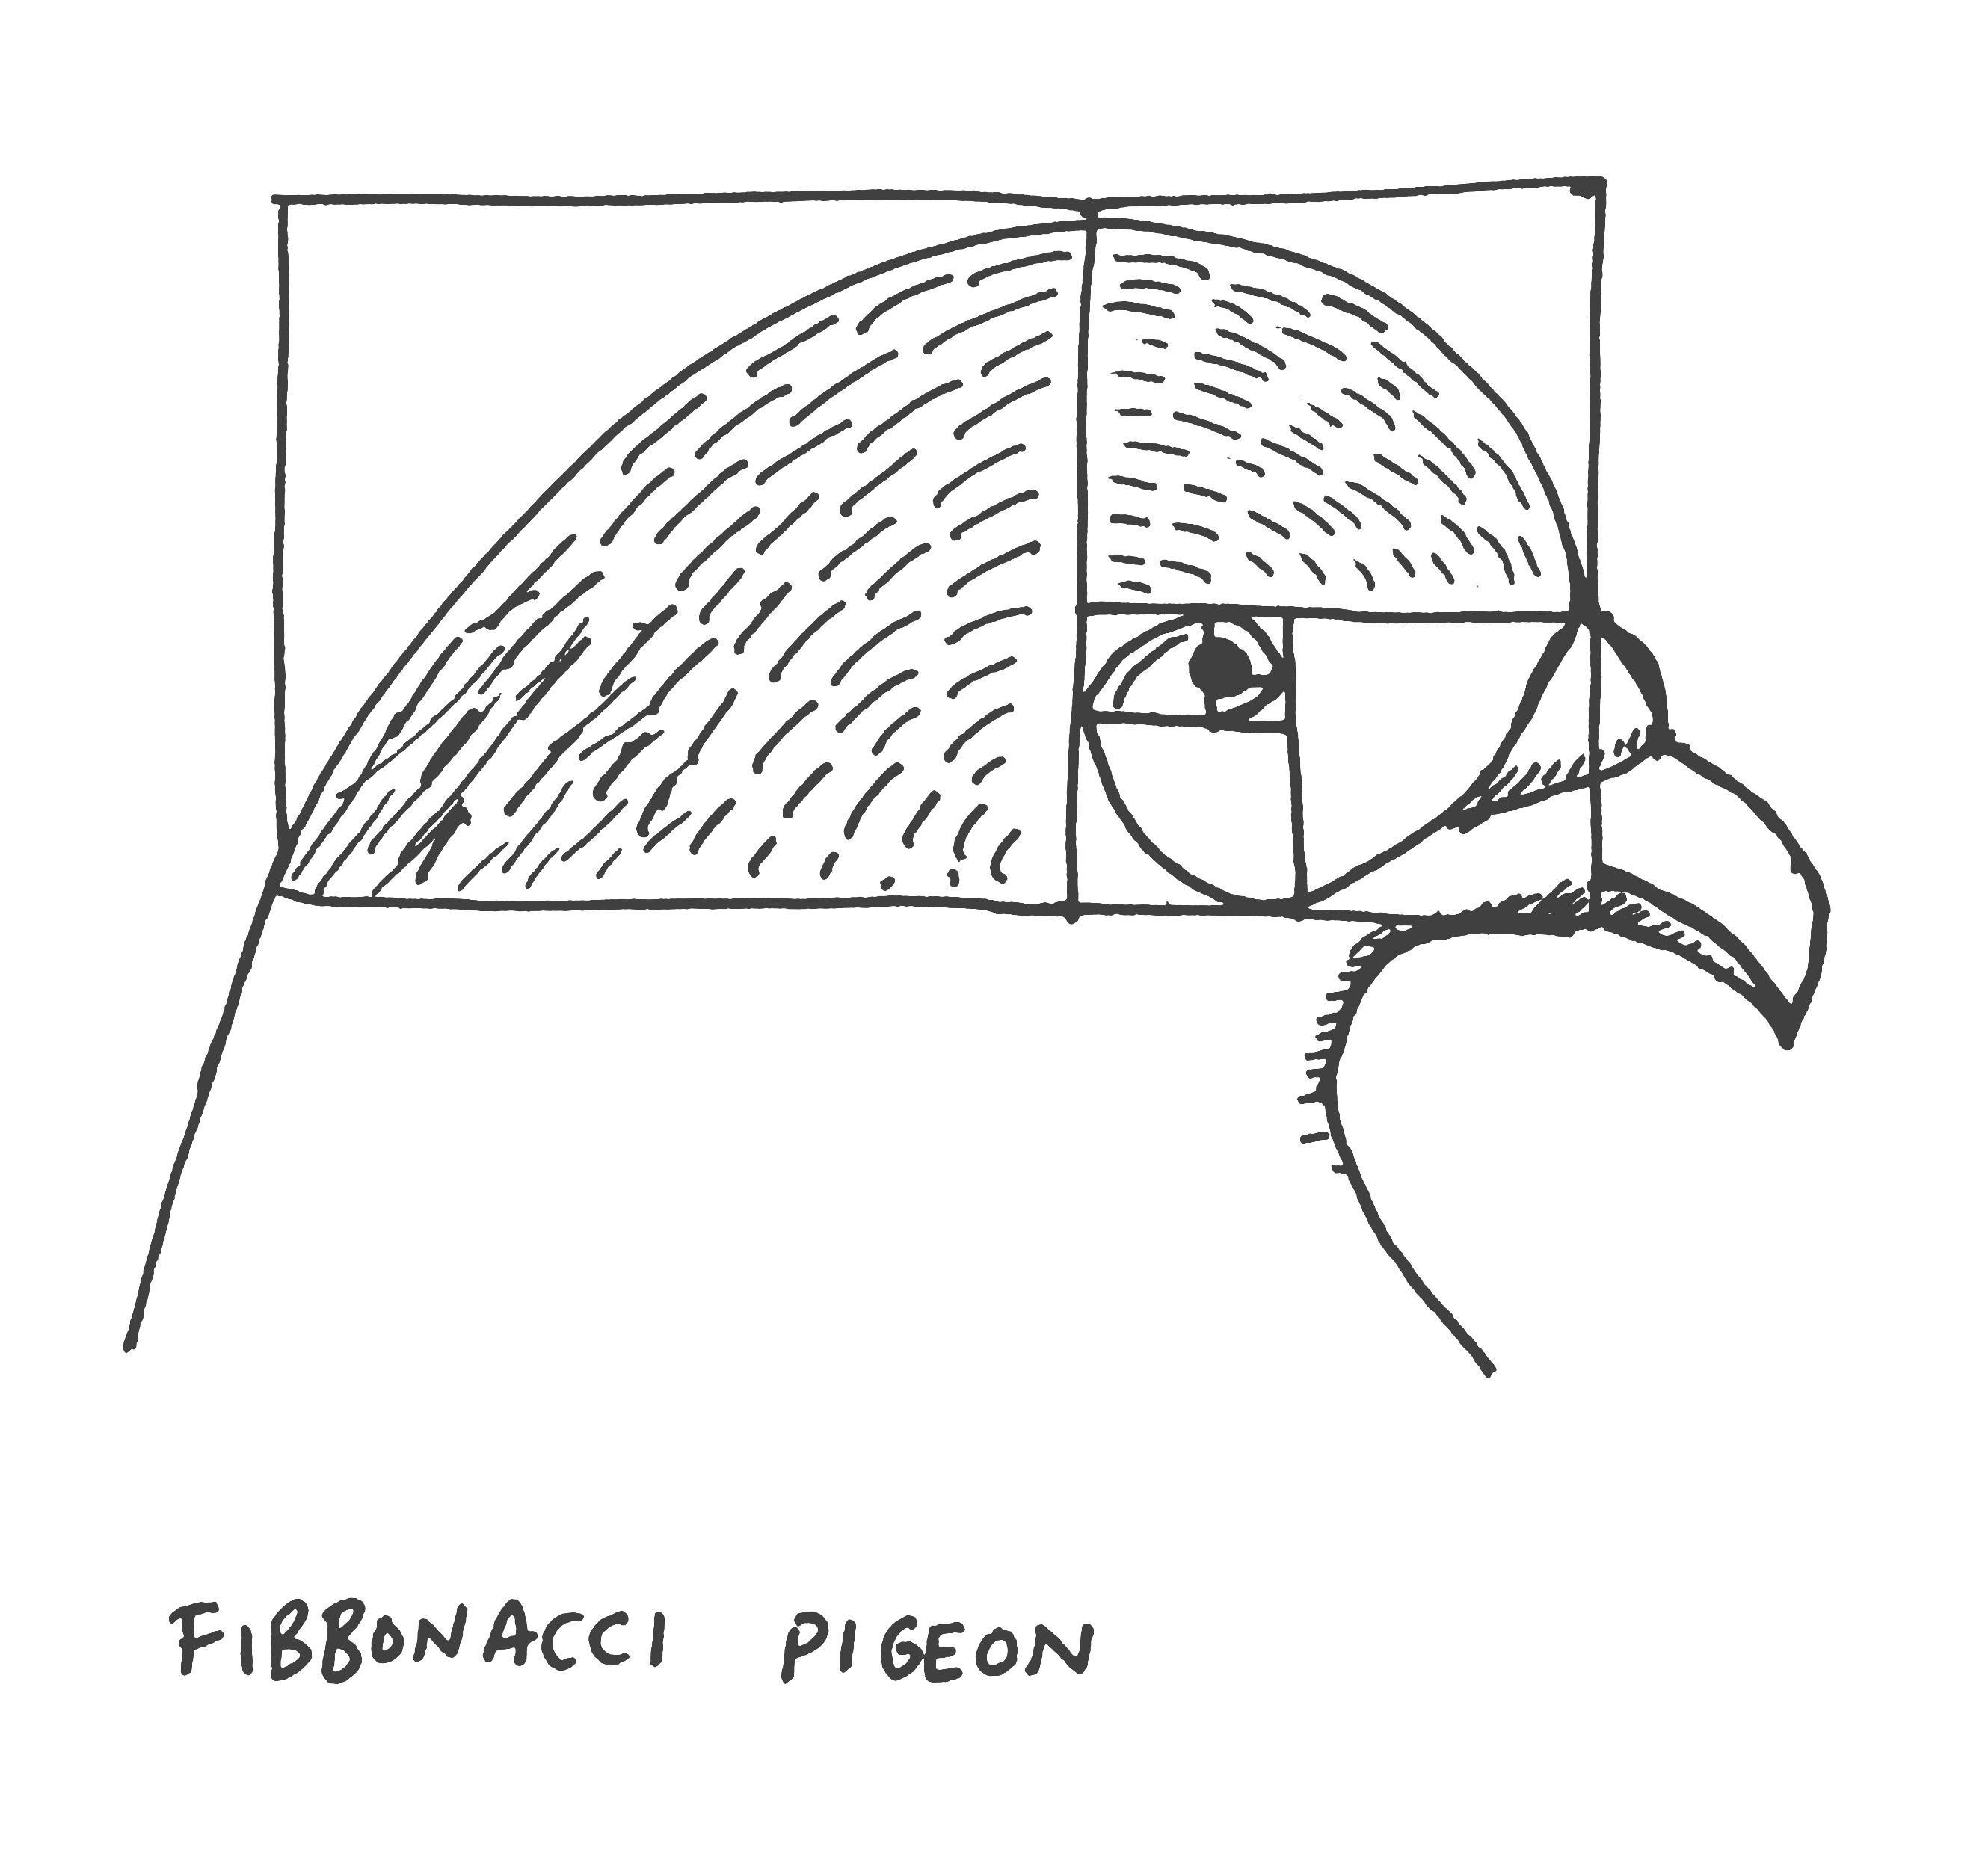 Fibbonacci pigeon